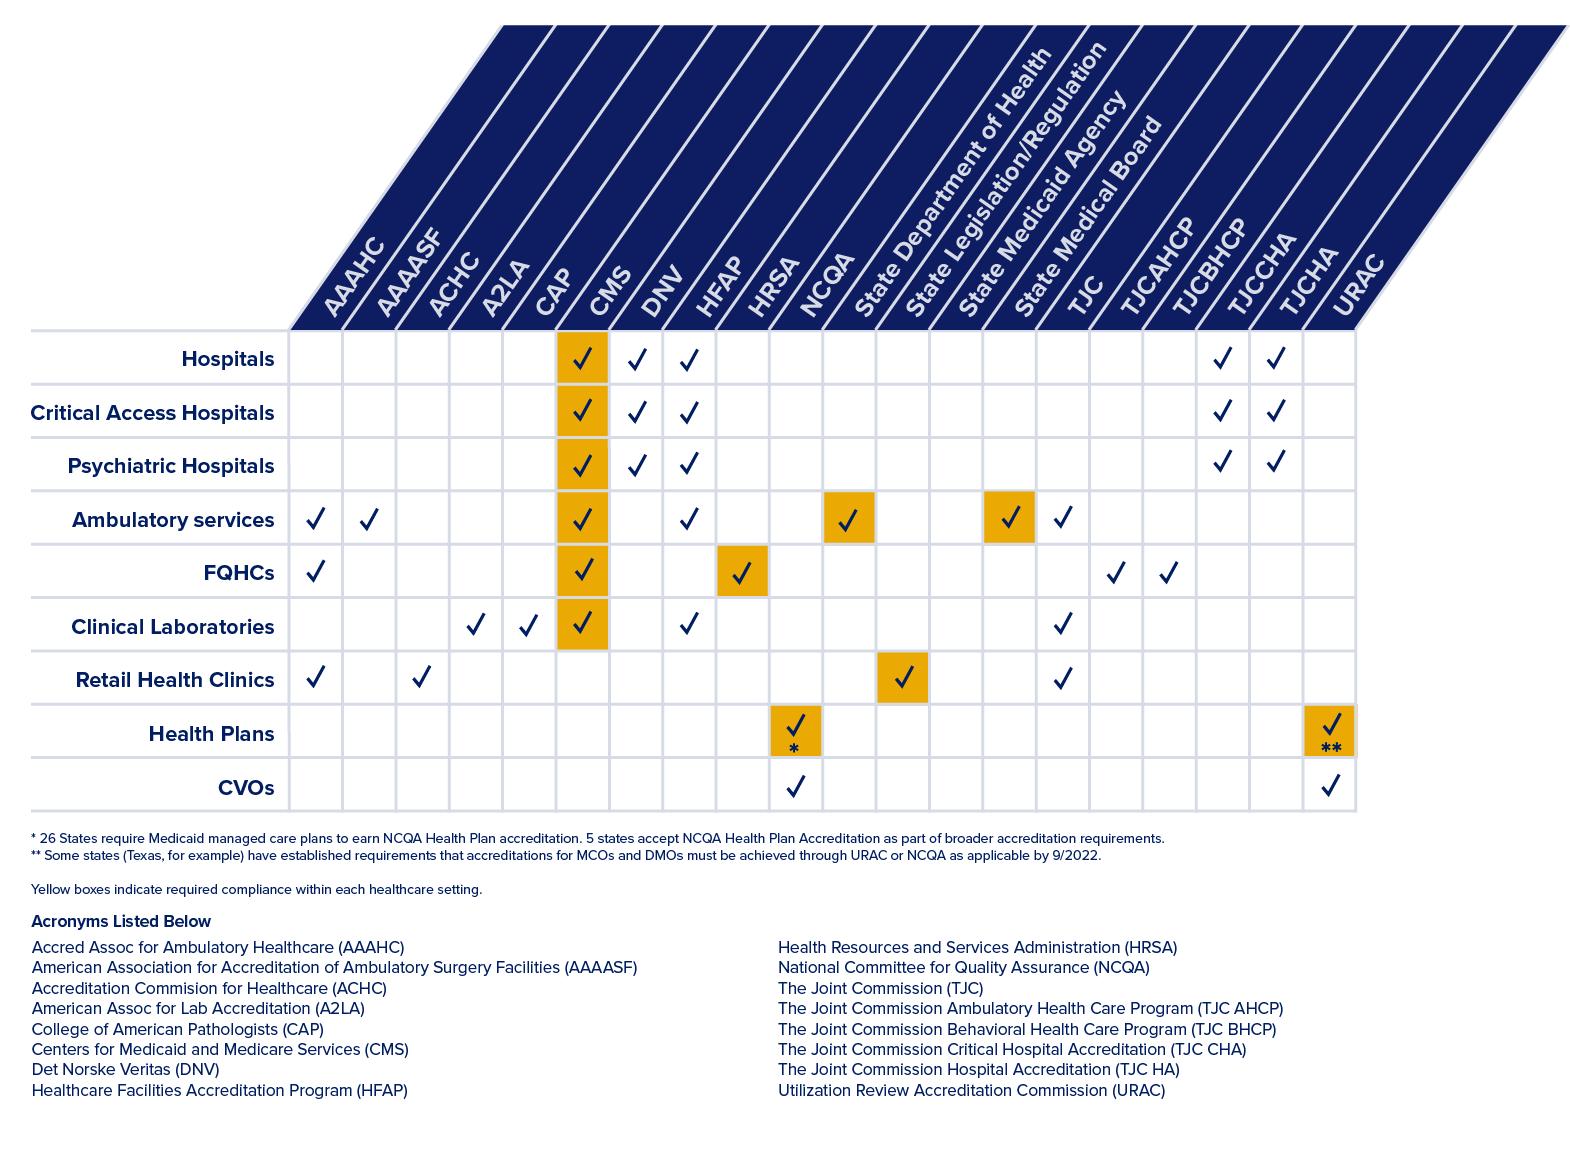 Healthcare Credentialing Regulatory Bodies Matrix Graphic